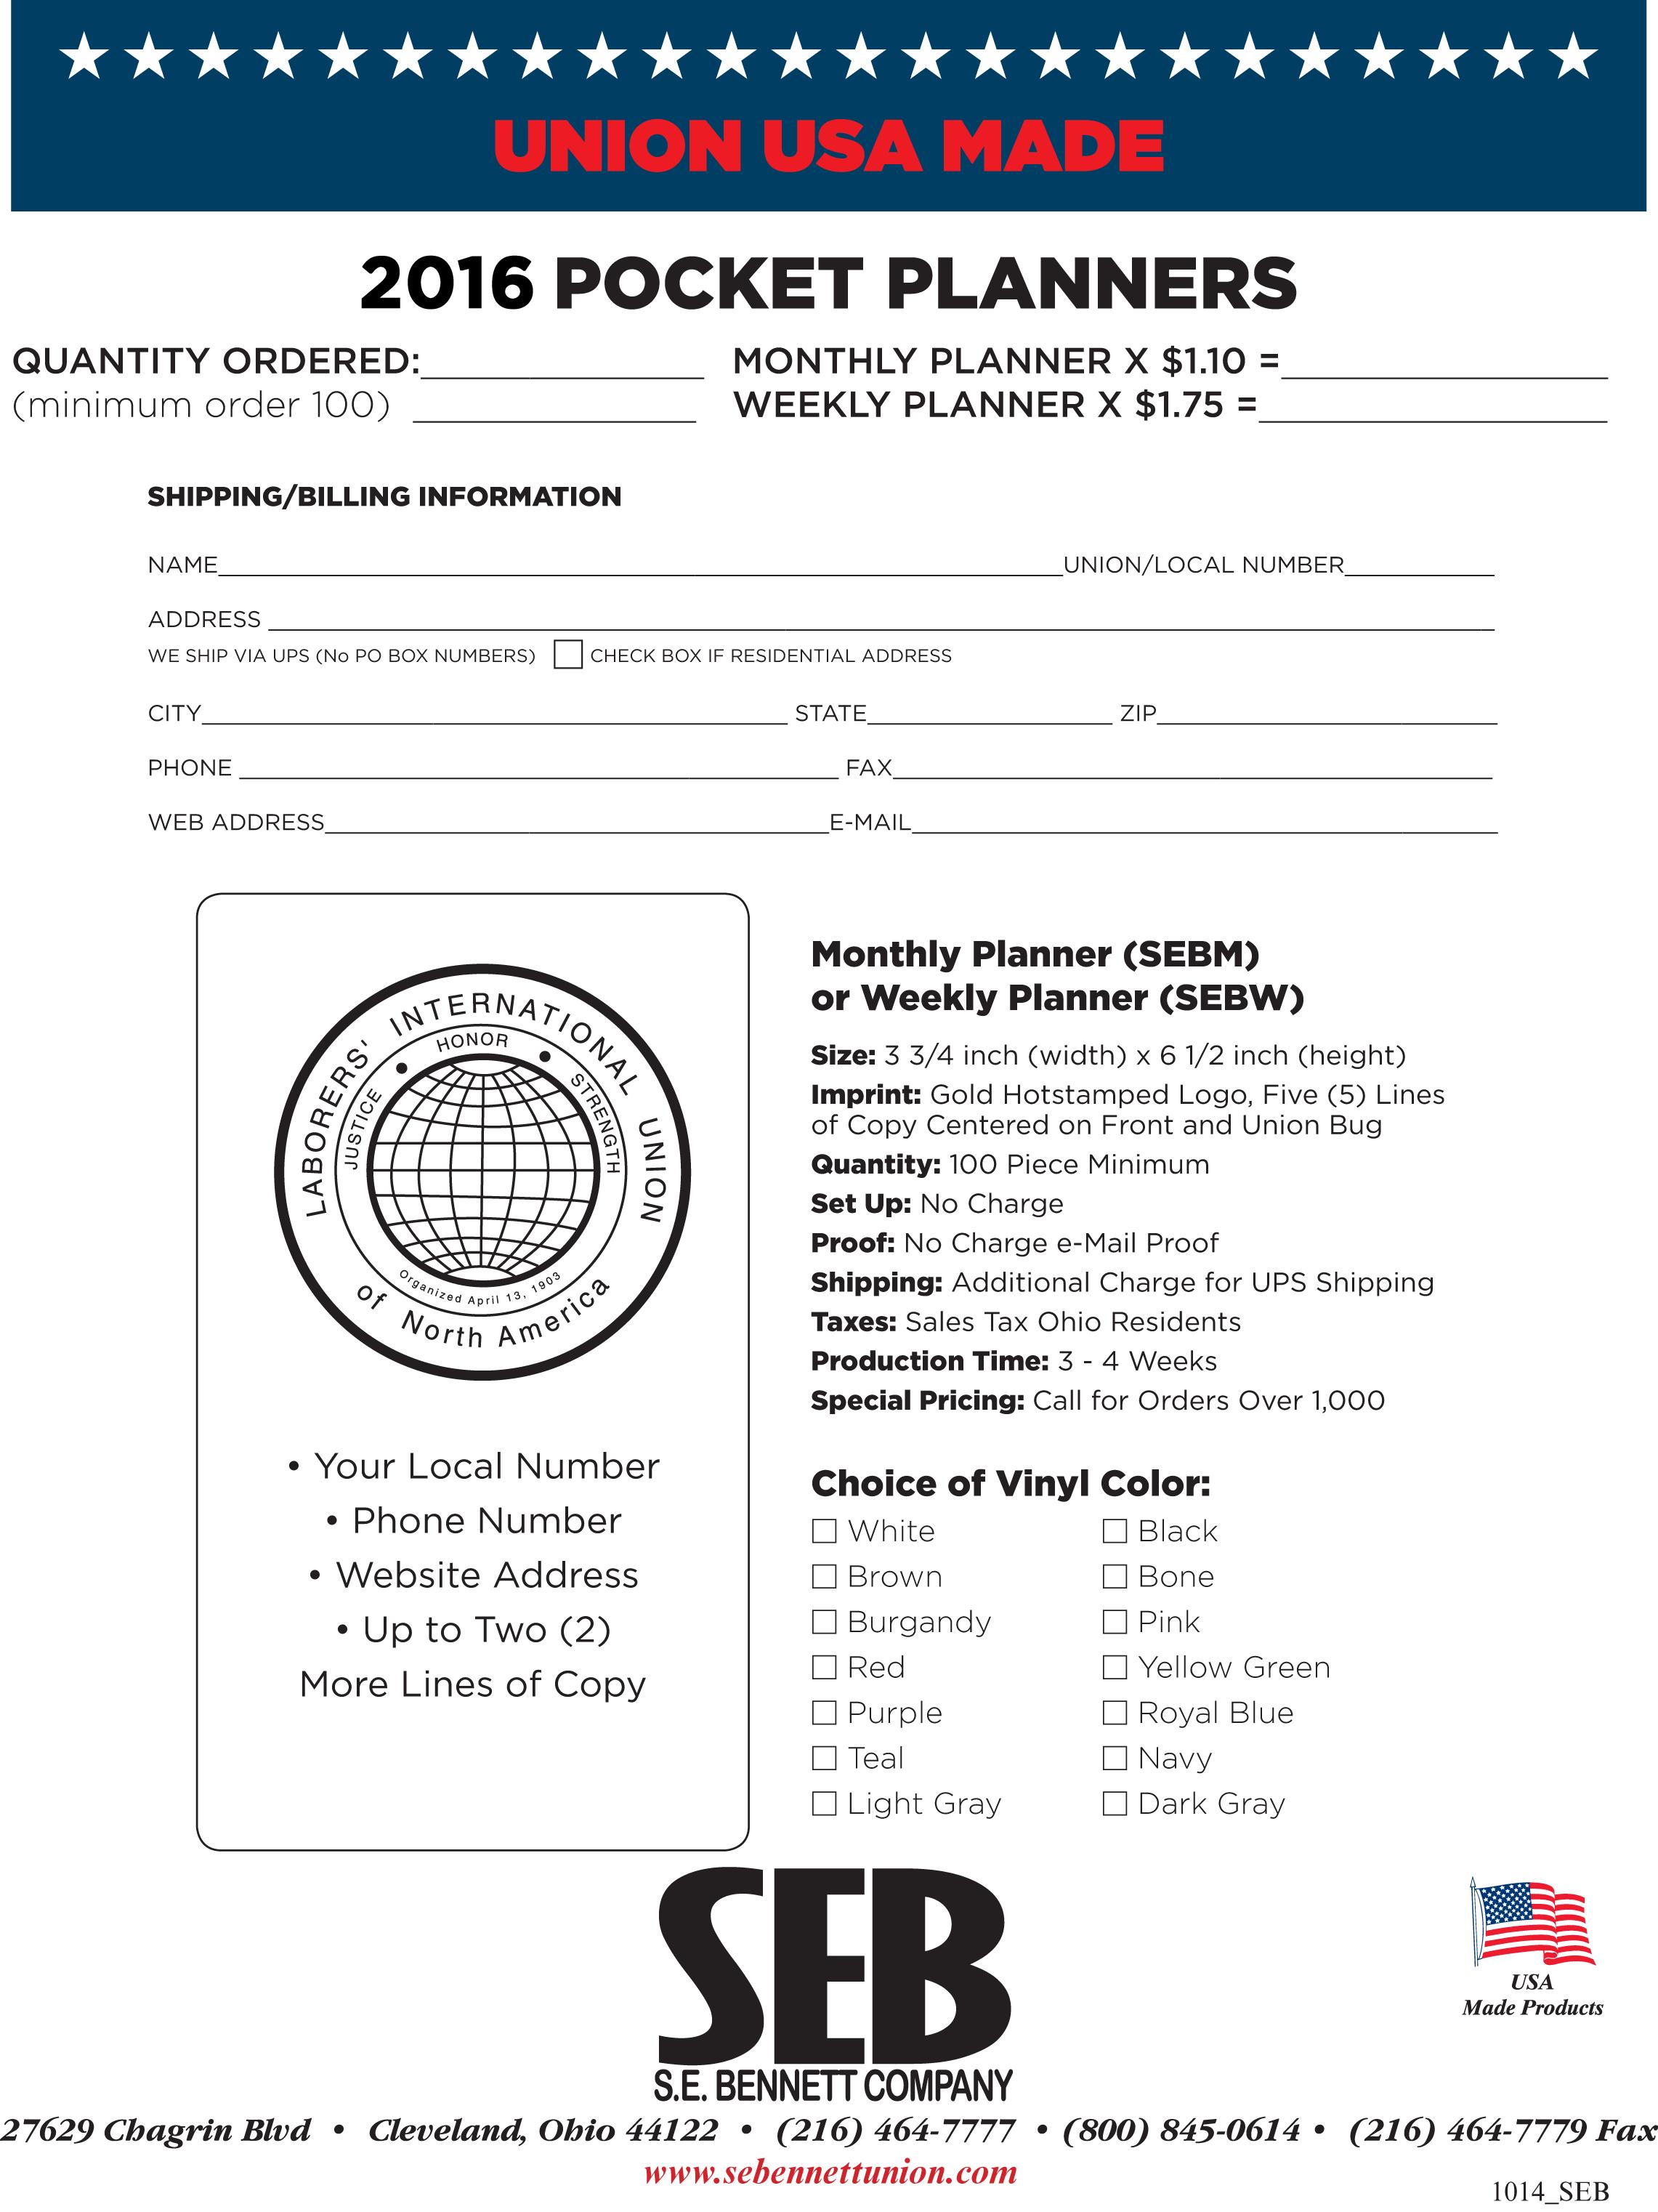 Laborers International Union Pocket Planner